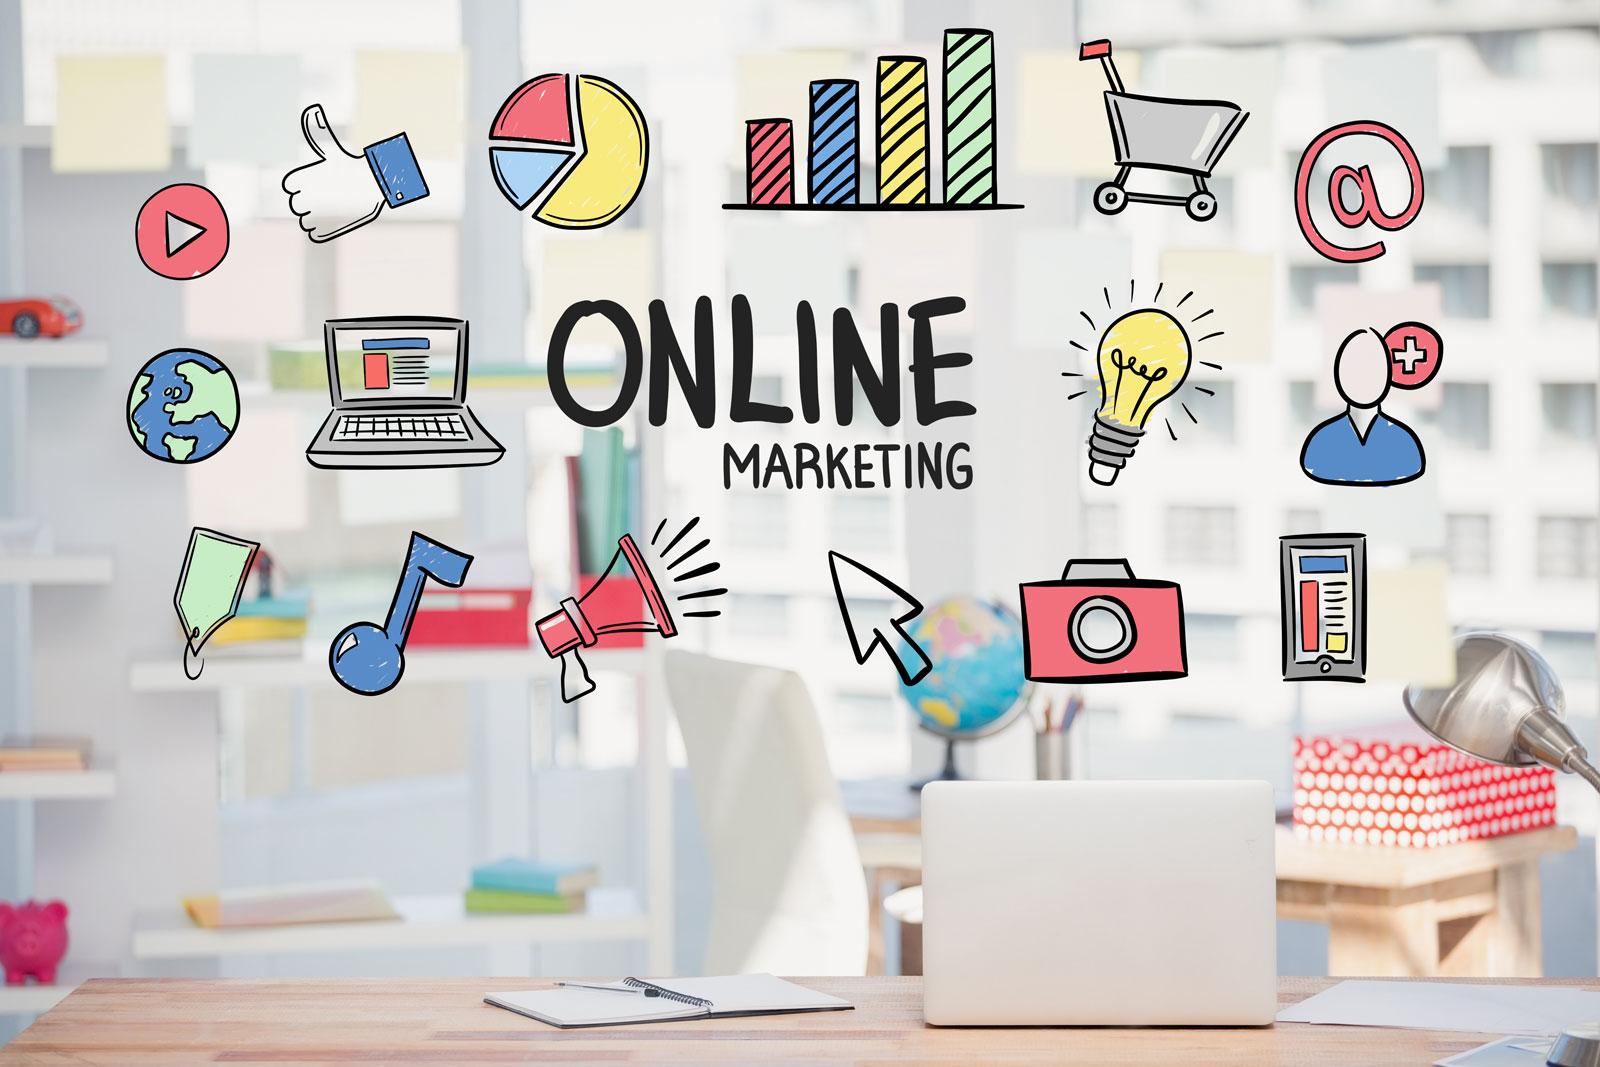 campañas-de-marketing-para-captar-empresas